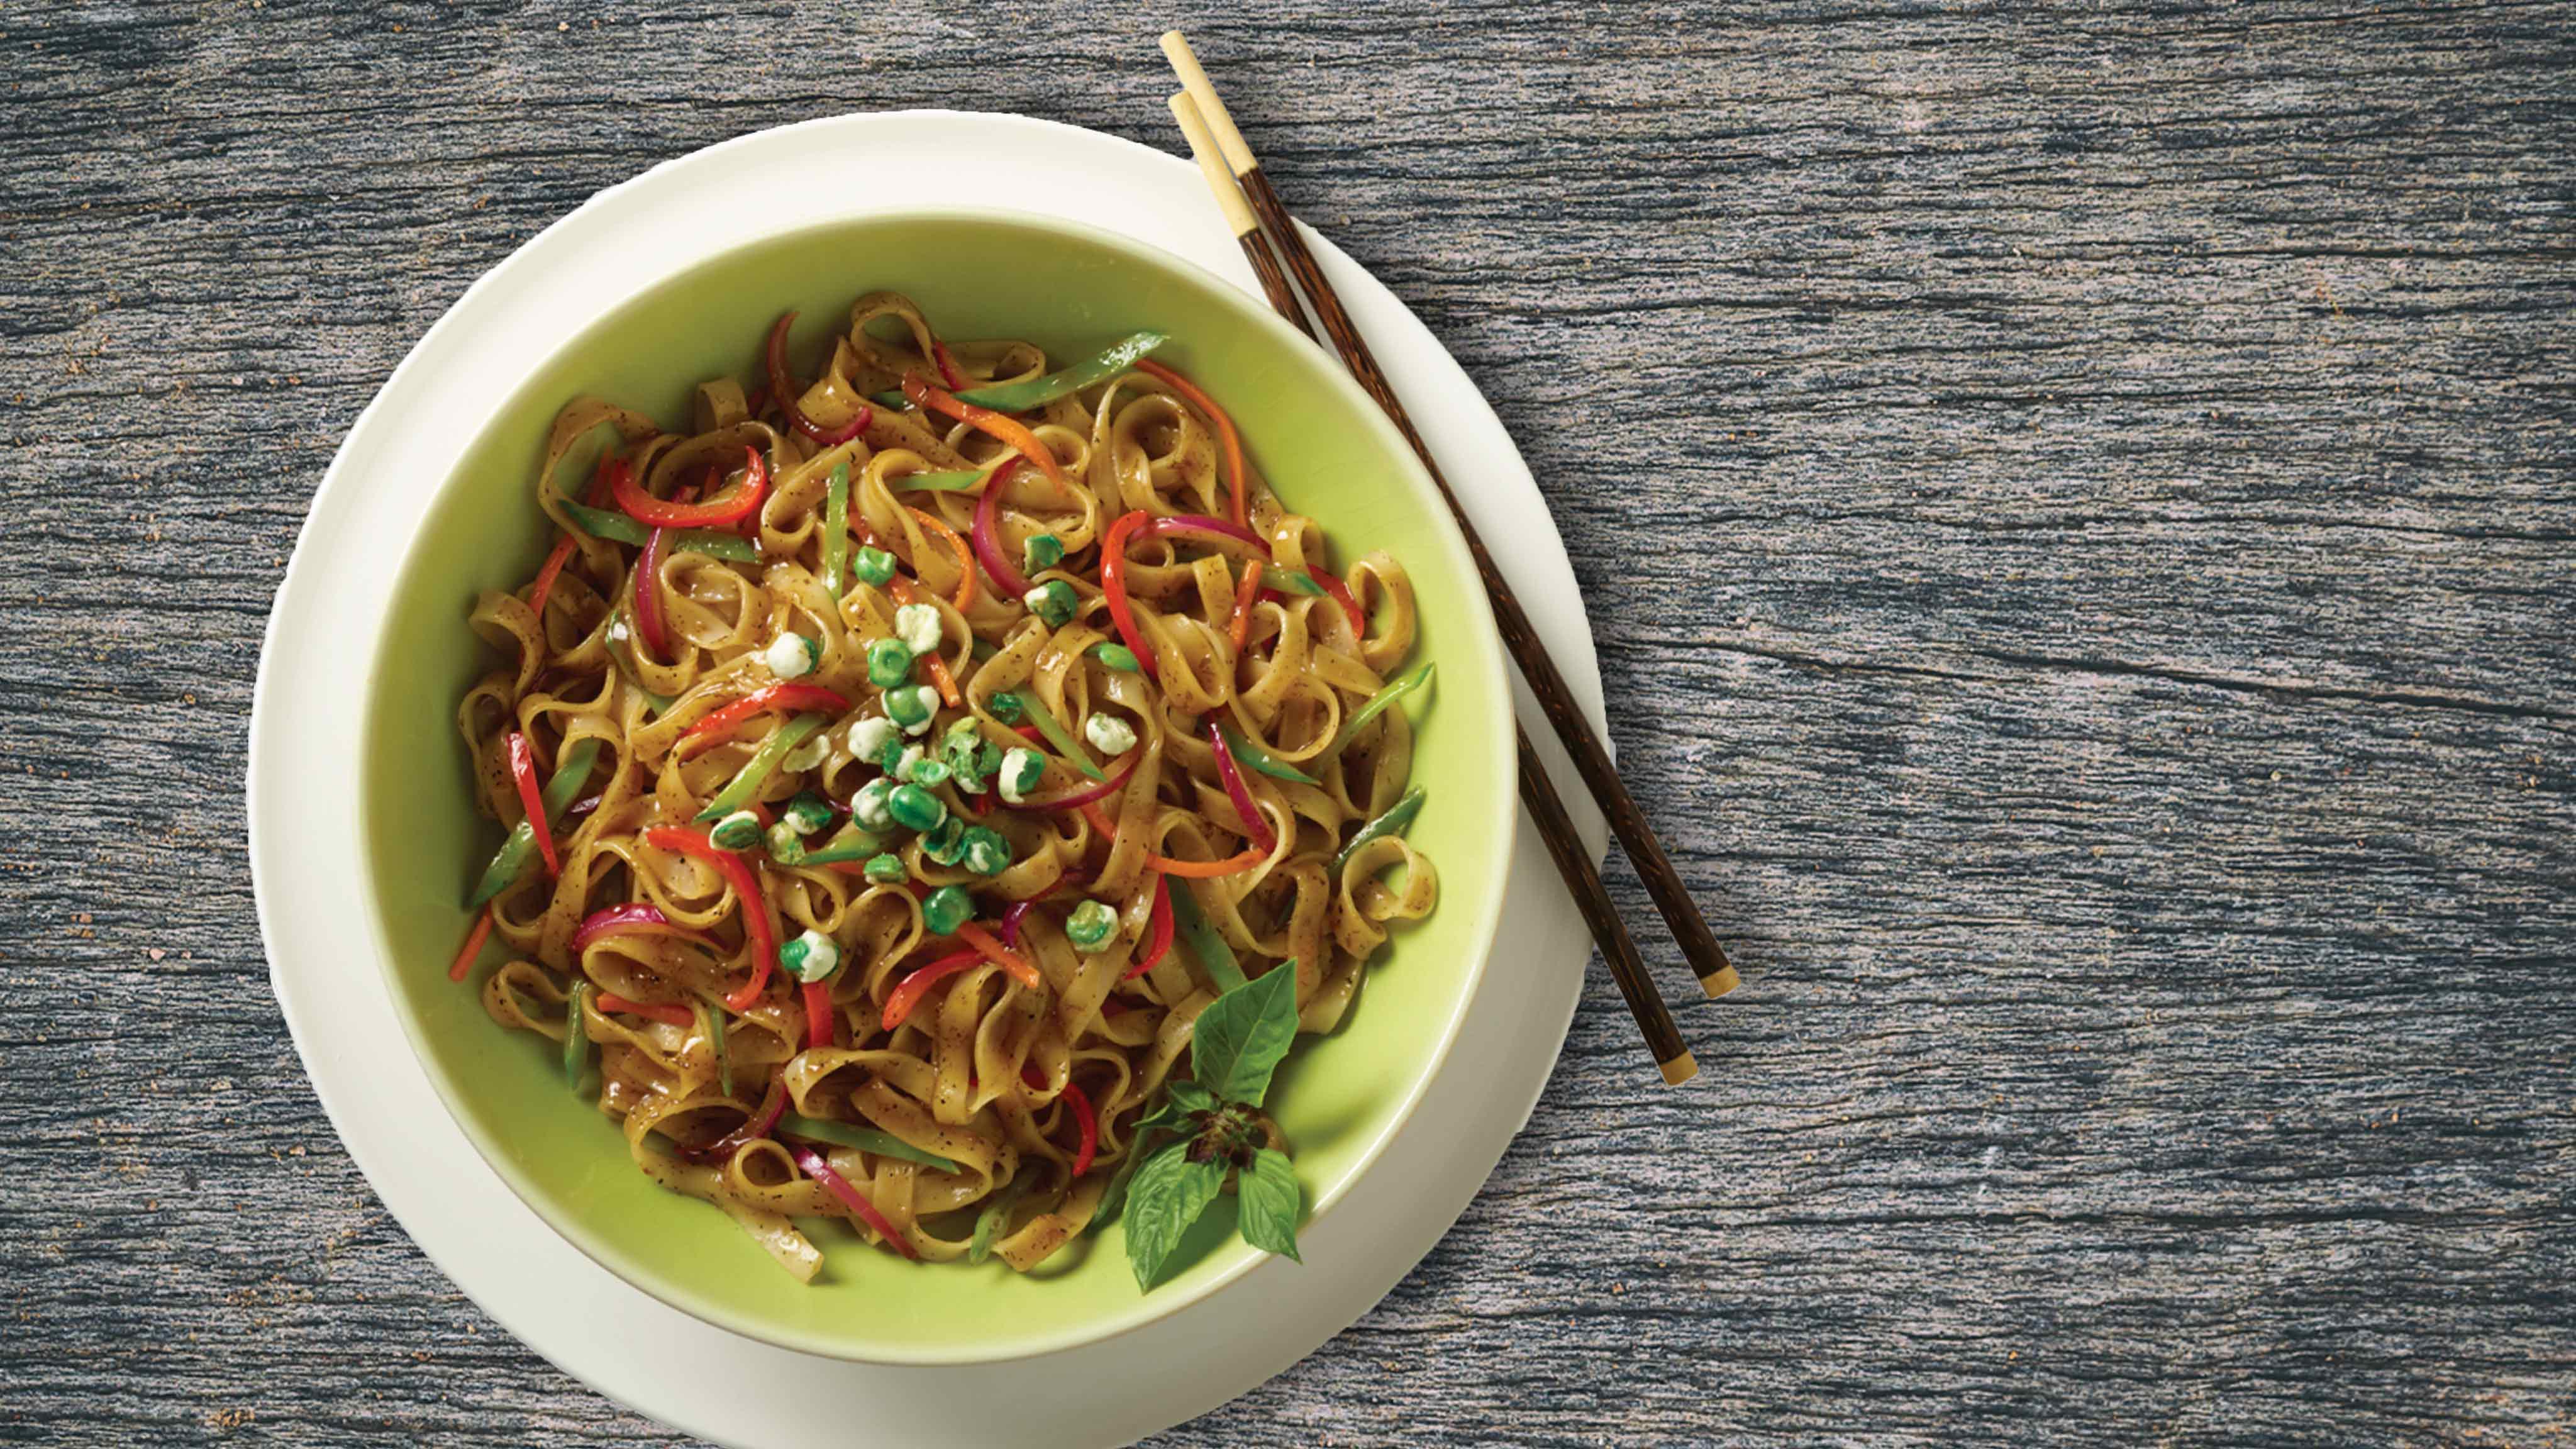 Image for Recipe Lemongrass Tamarind Rice Noodles and Vegetables